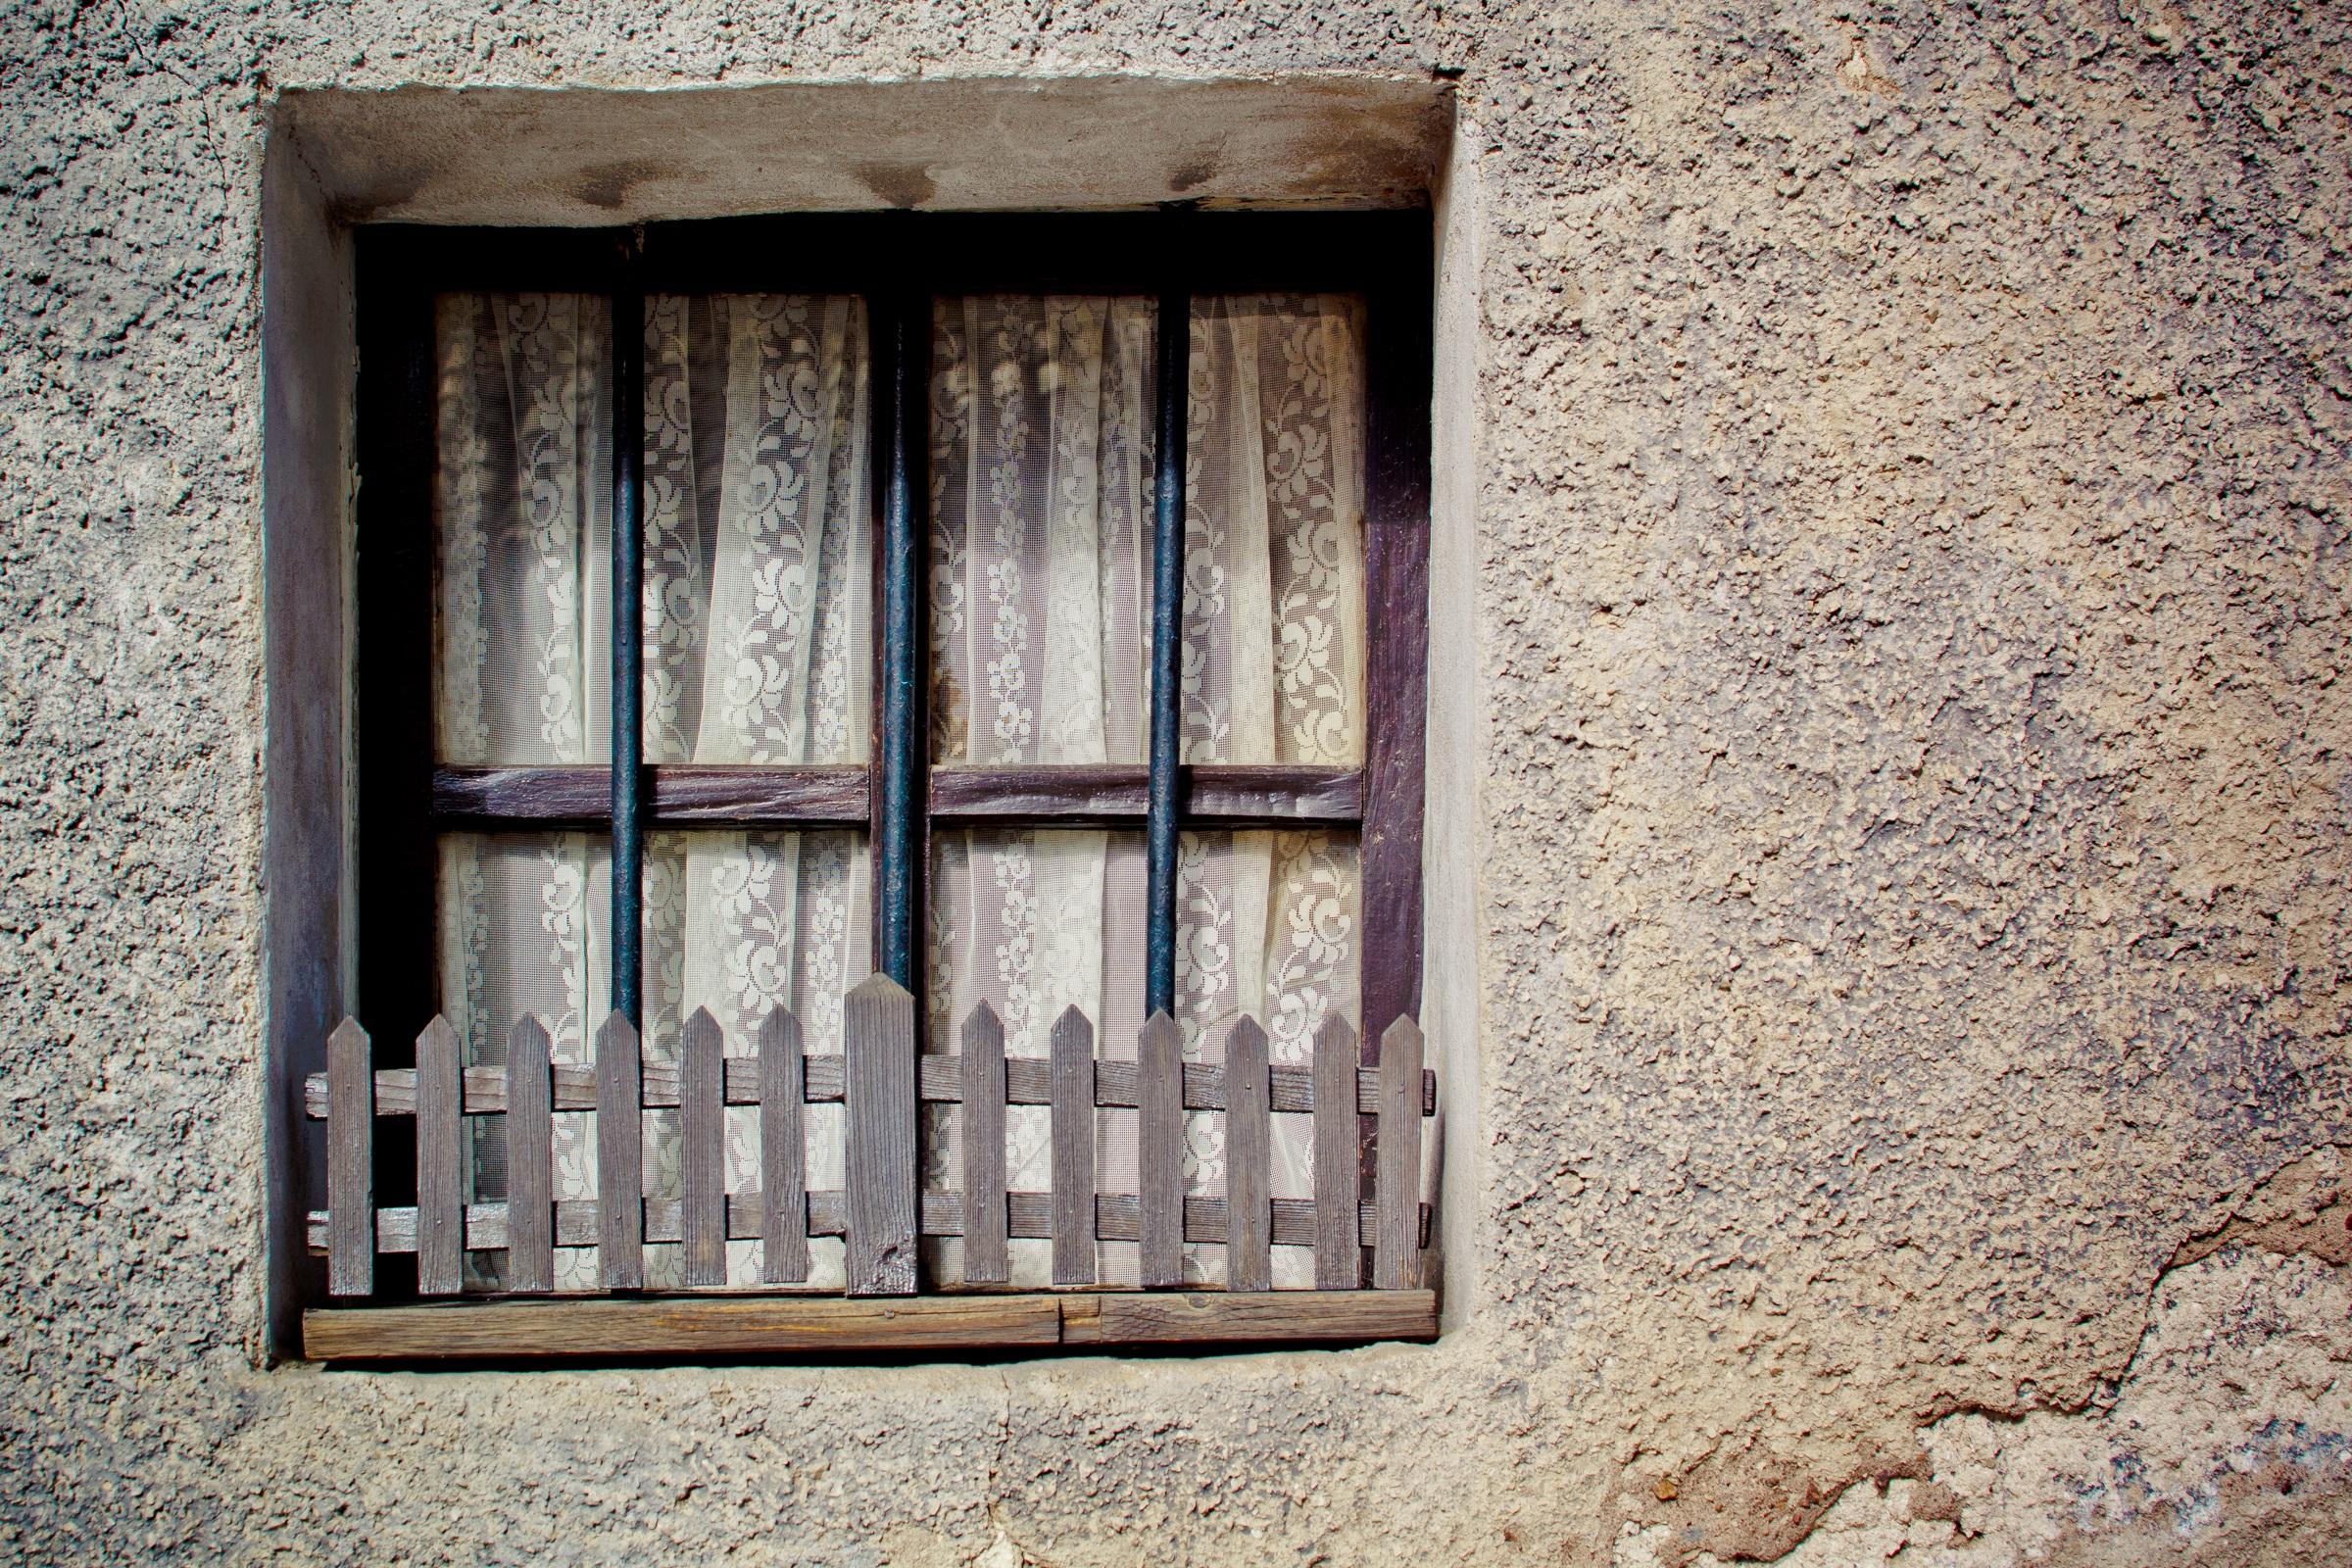 Fotos gratis : cerca, estructura, casa, vaso, antiguo, pared ...